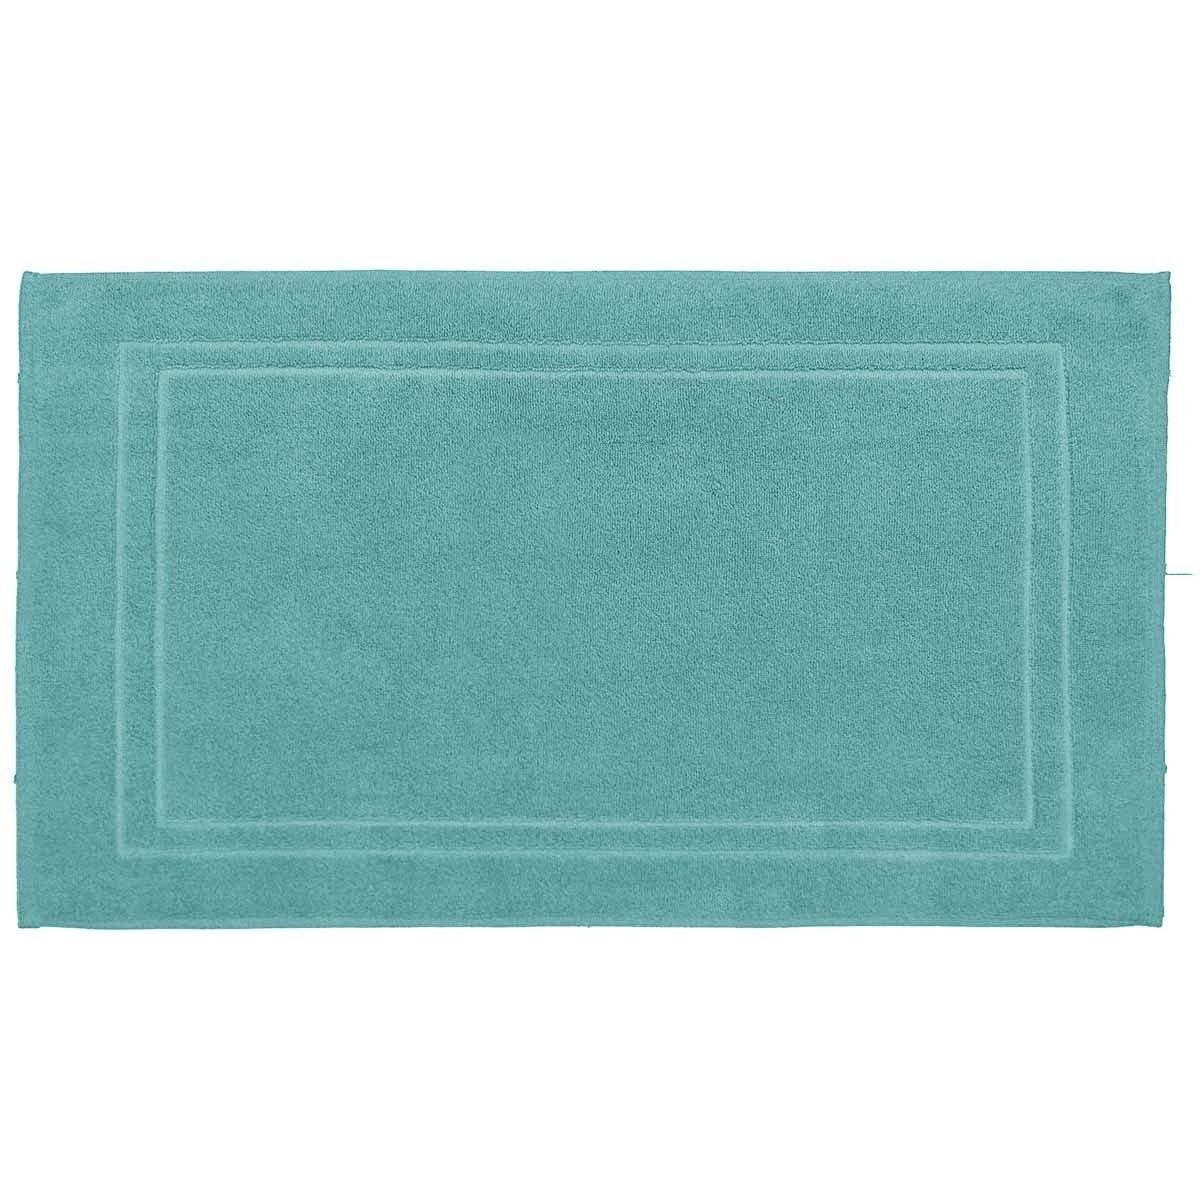 Tapis de bain 900gr/m² Aqua 50x80 cm